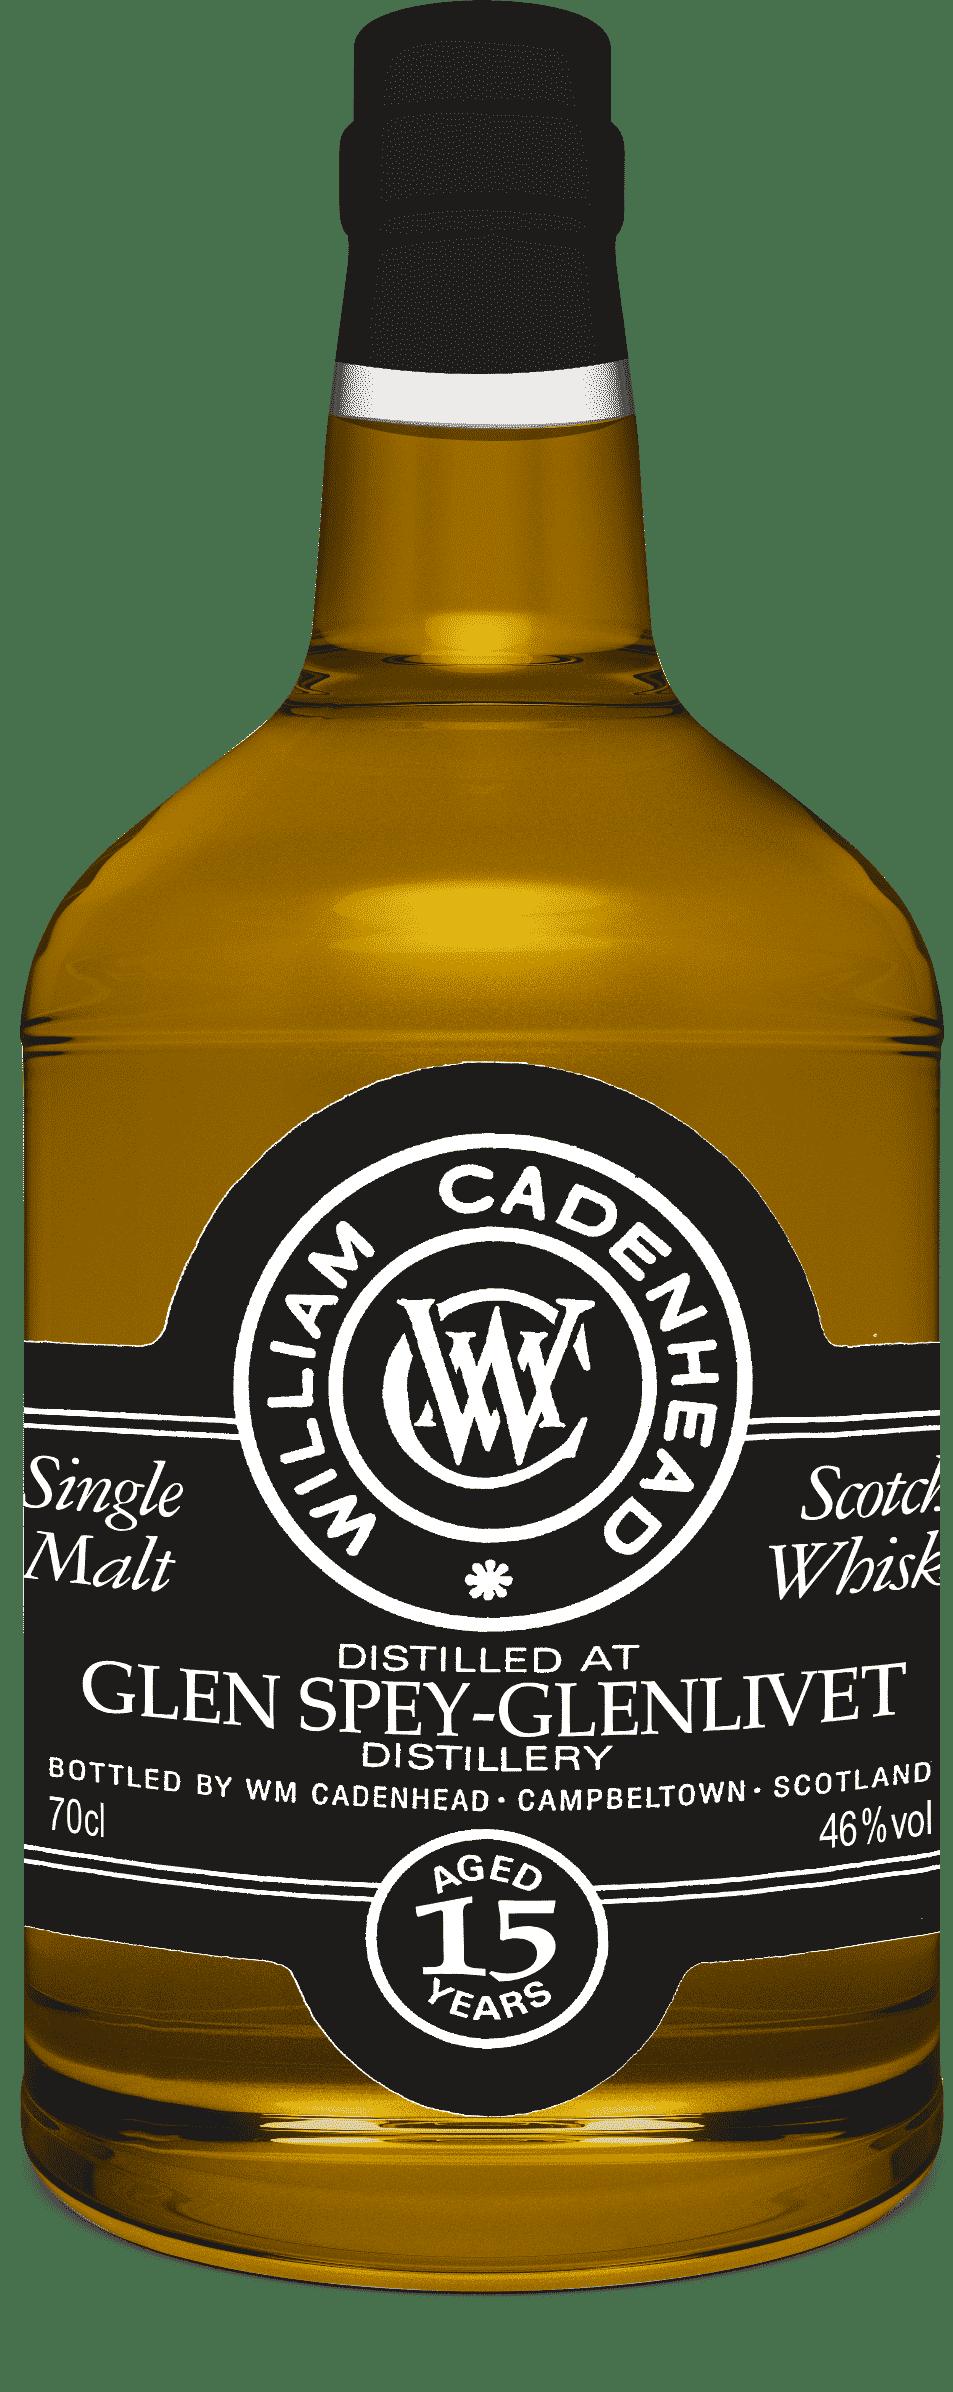 A Bottle of Glen-spey-Glenlivet